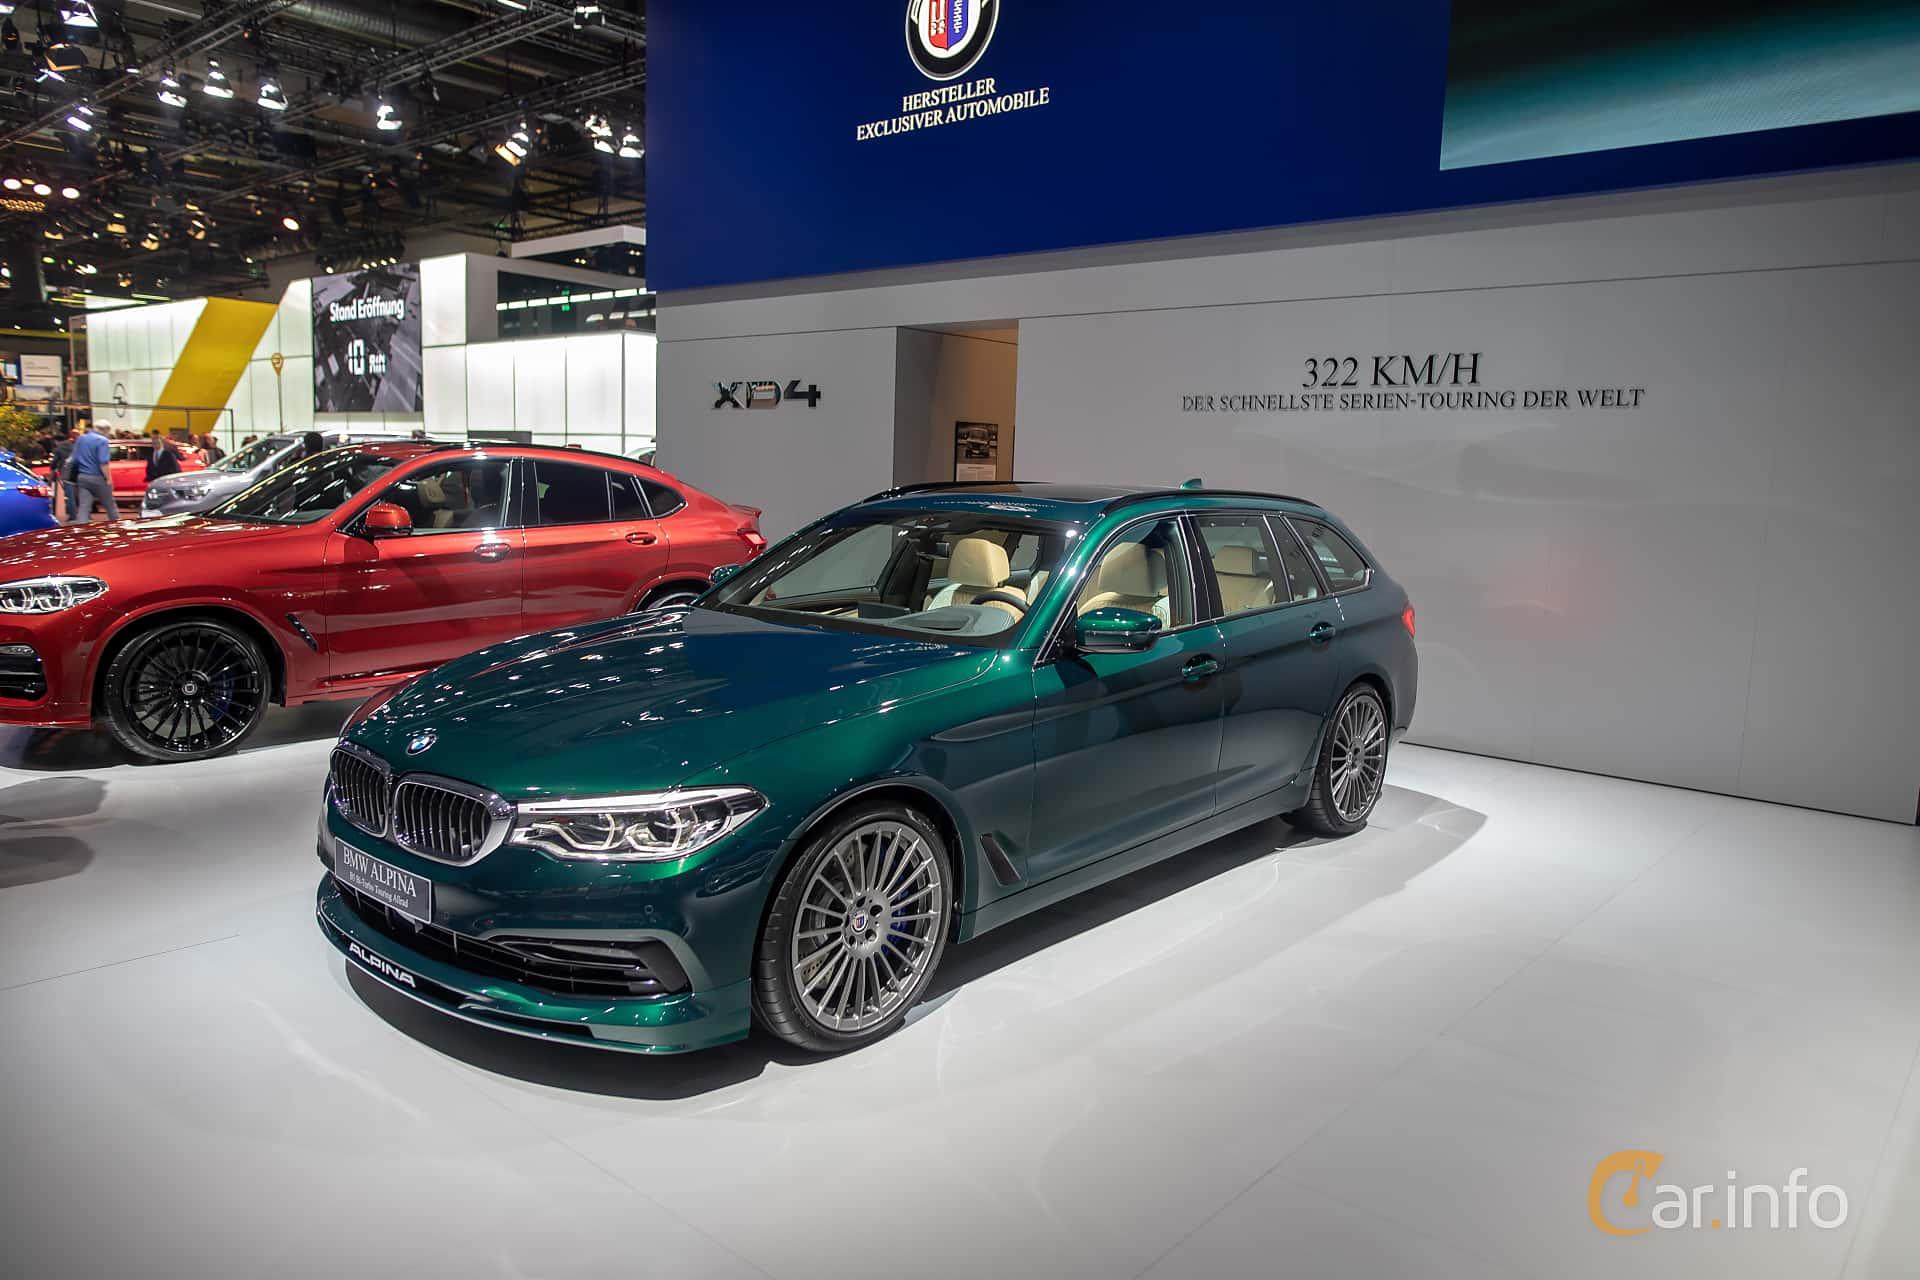 2020 Bmw Alpina B5 Touring